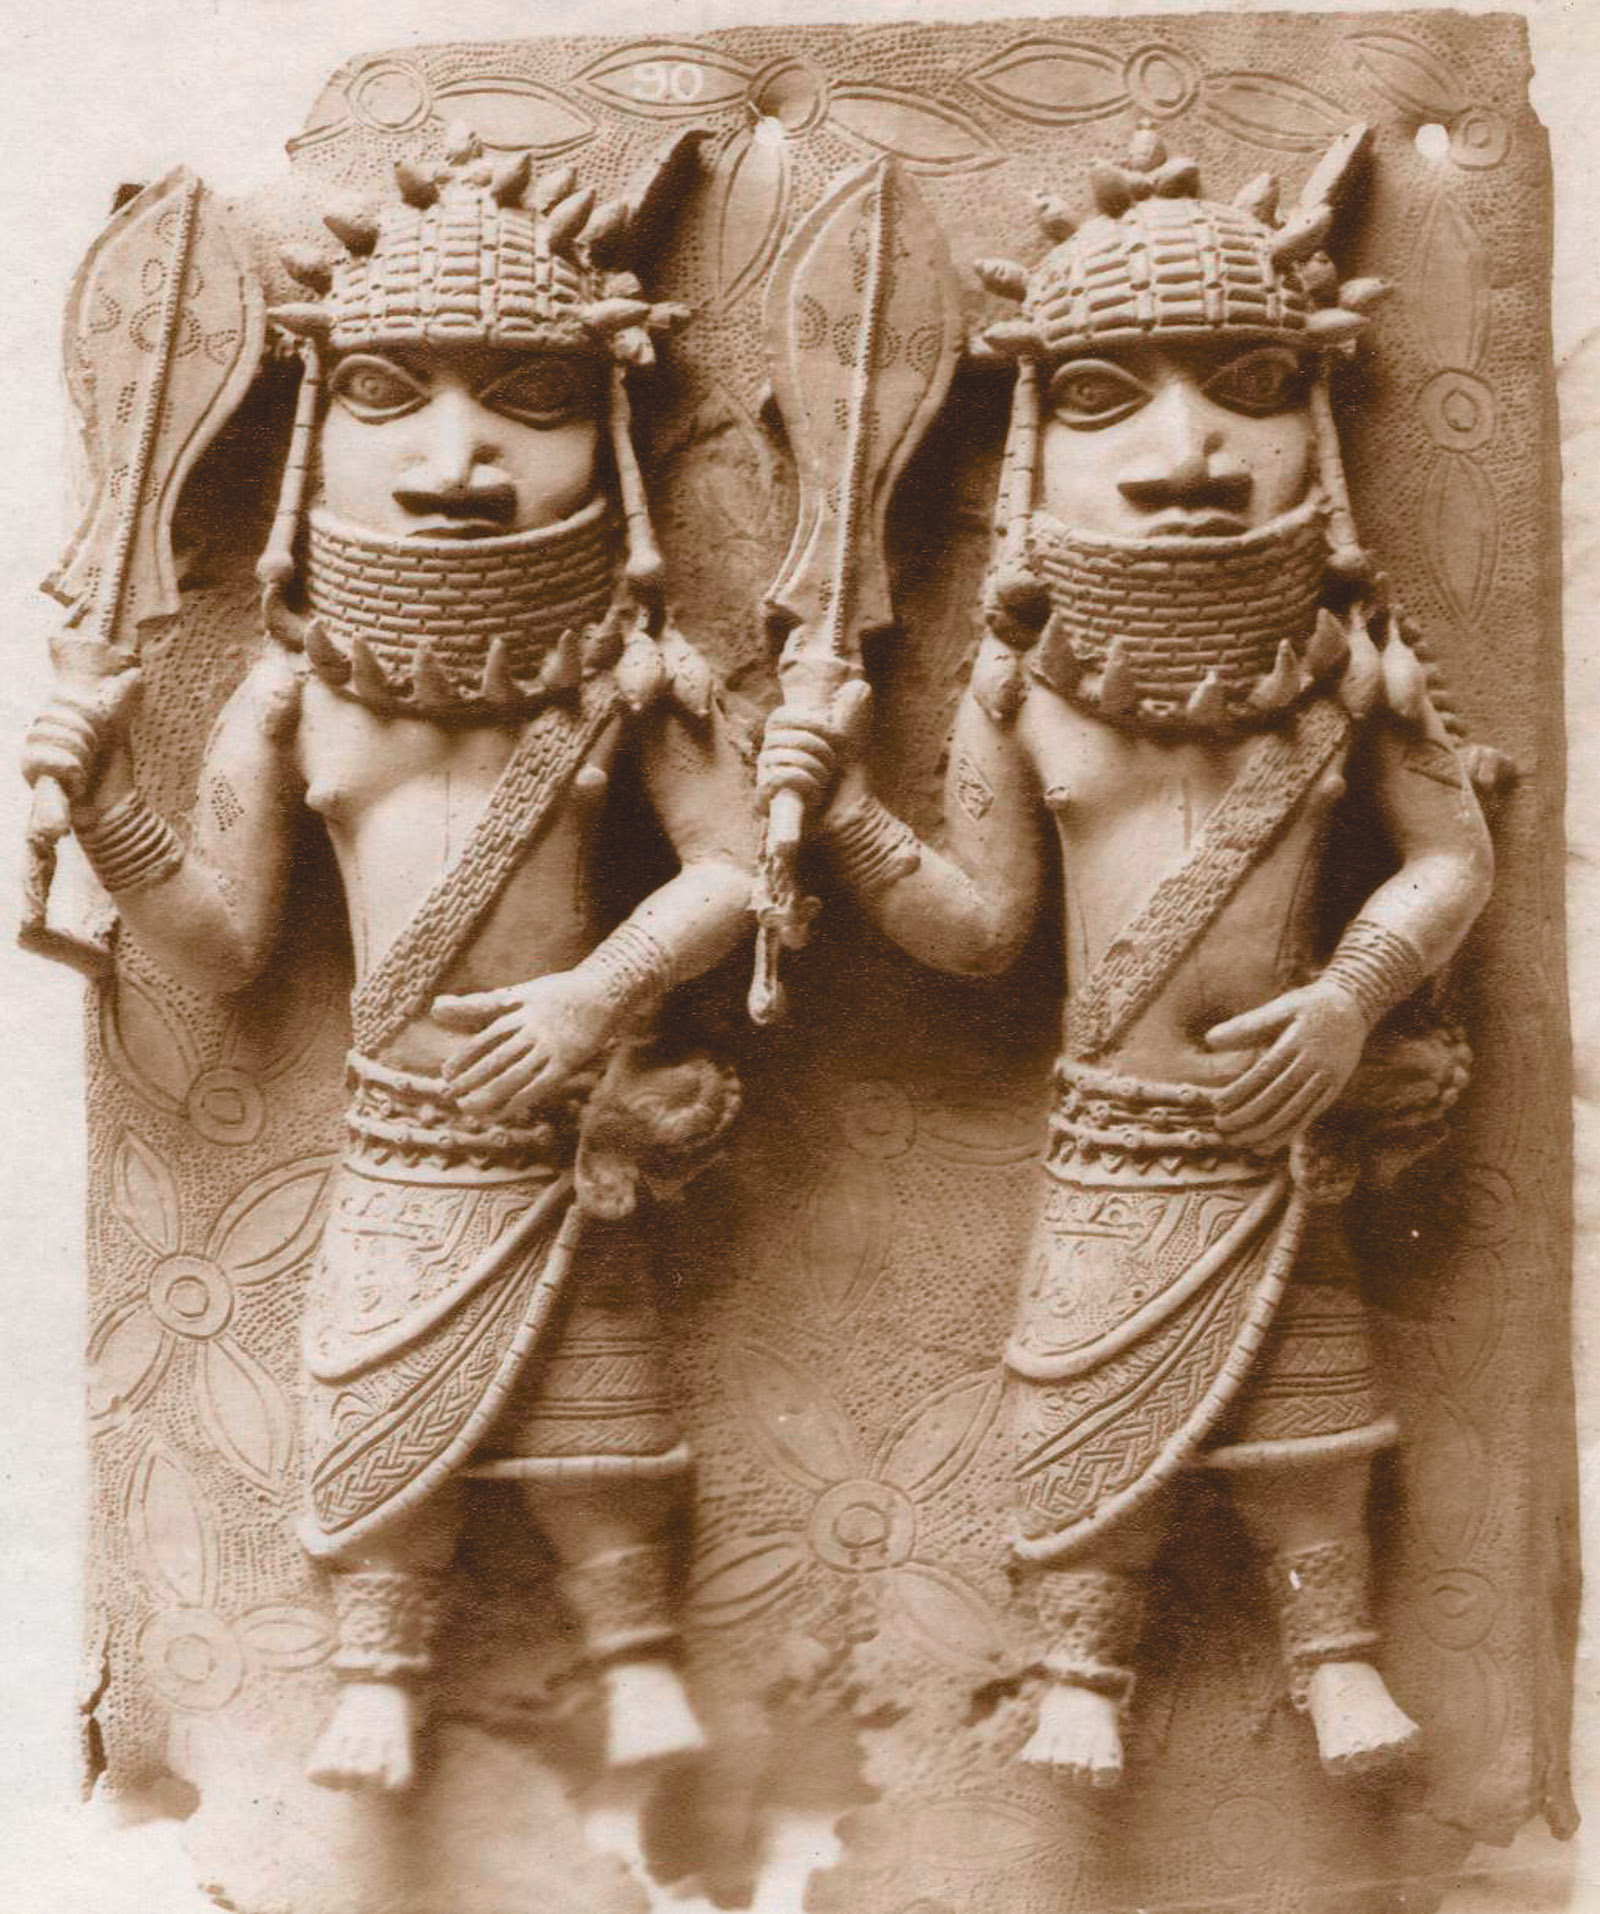 Benin Bronze plaque showing two officials with raised swords